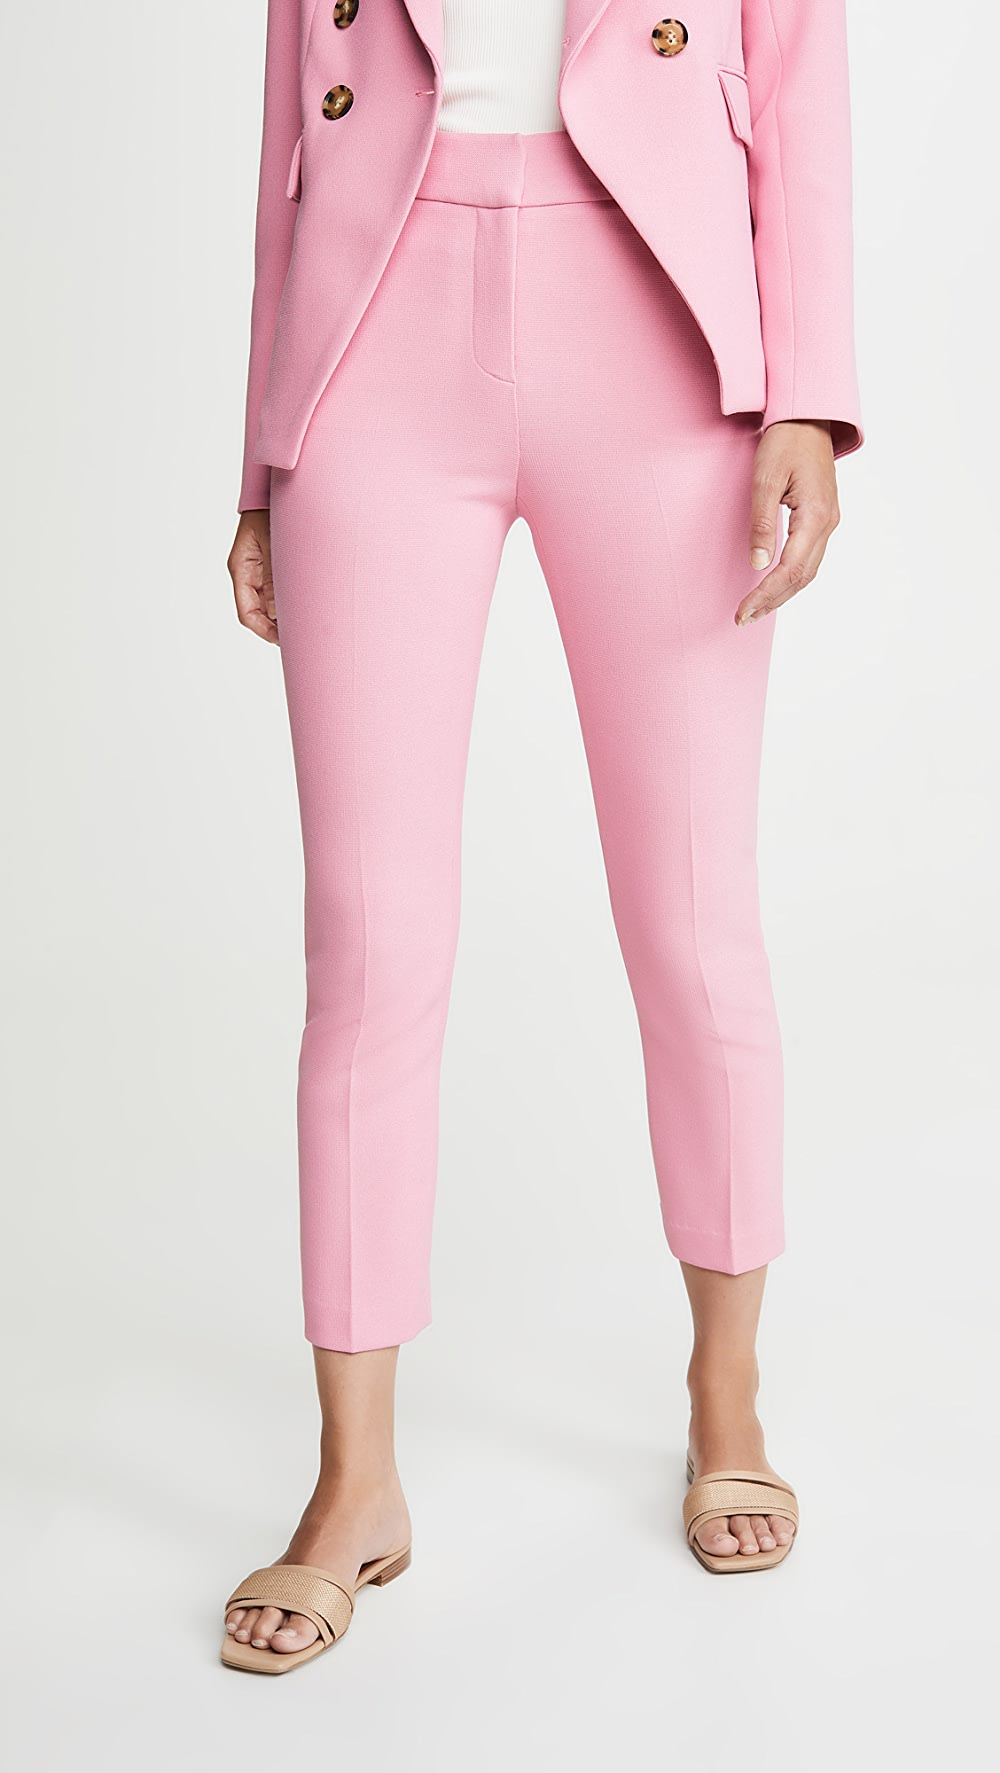 2019 Fashion Veronica Beard - Gamila Pants To Invigorate Health Effectively